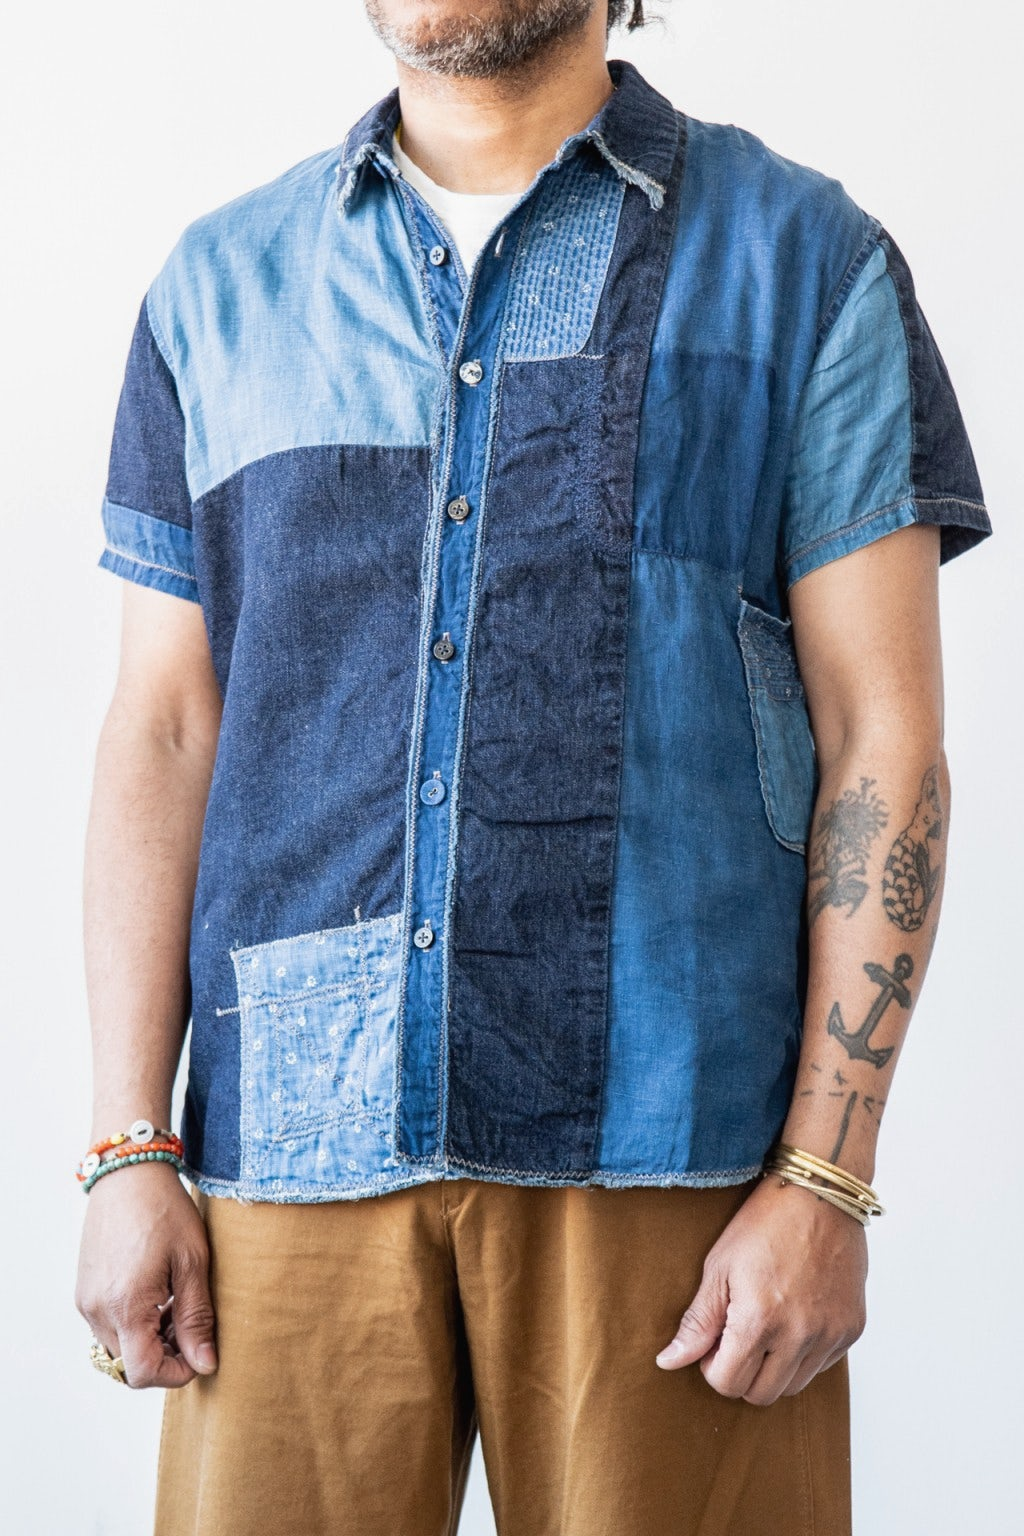 Kapital IDG Patchwork KATMANDU Shirt Indigo